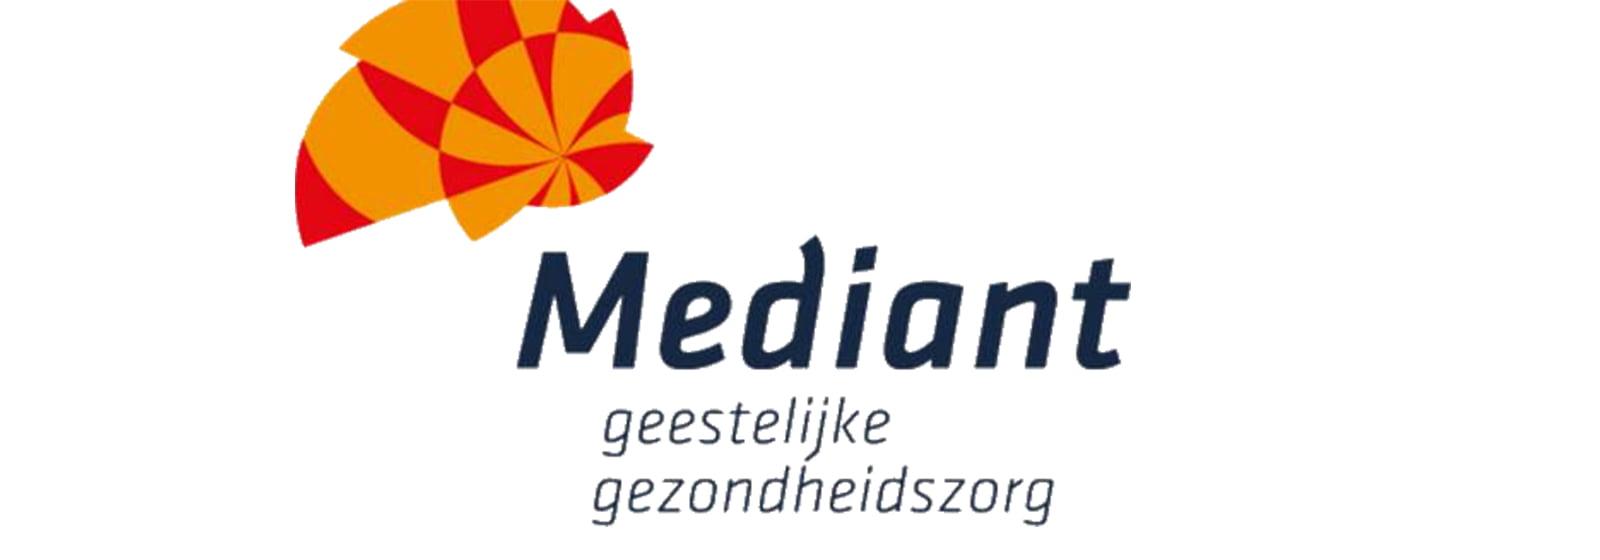 logo-mediant-presentatiemiddelen-narrowcasting